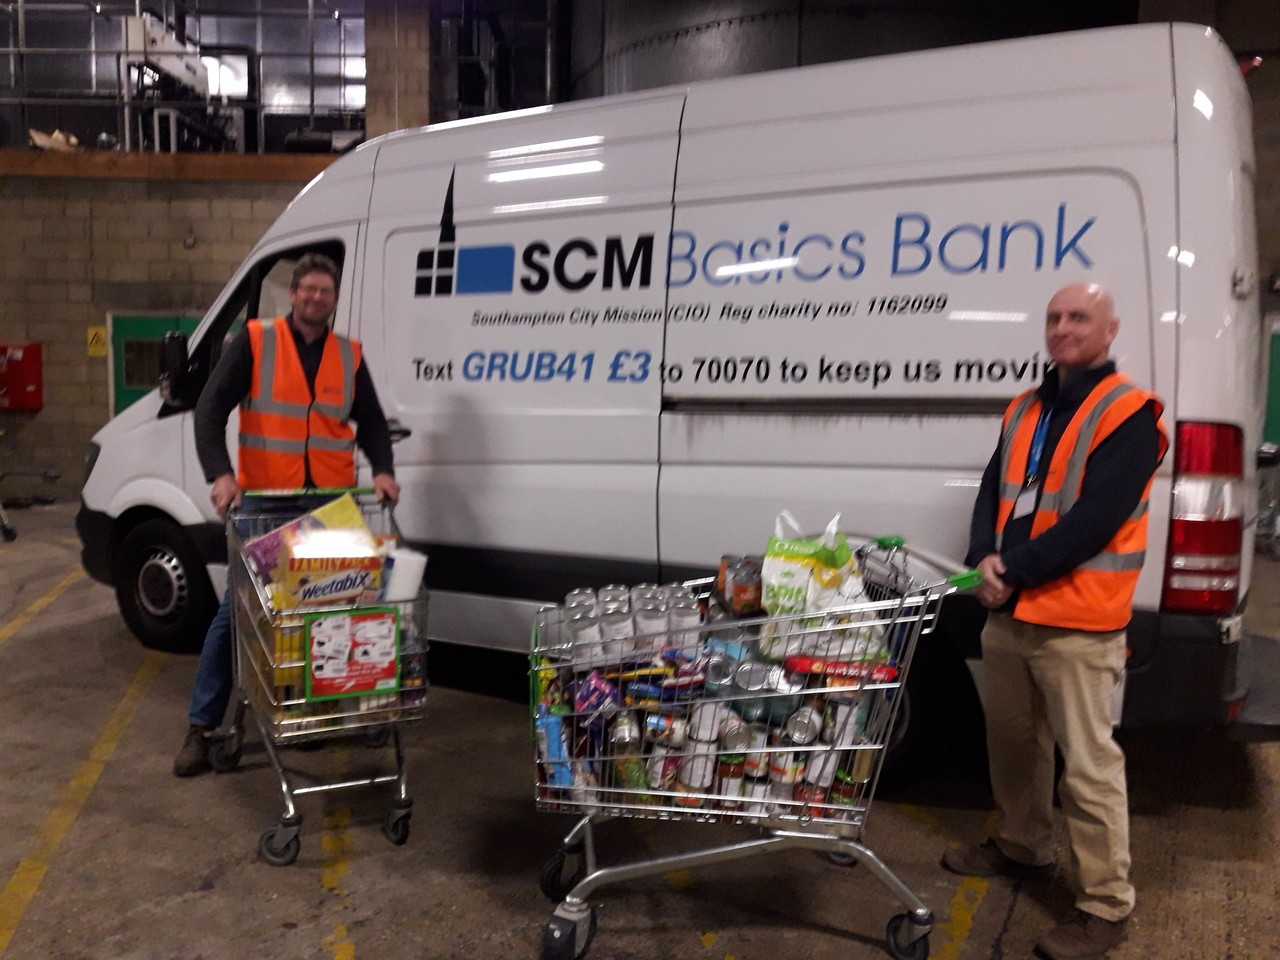 Supporting Southampton City Mission | Asda Southampton